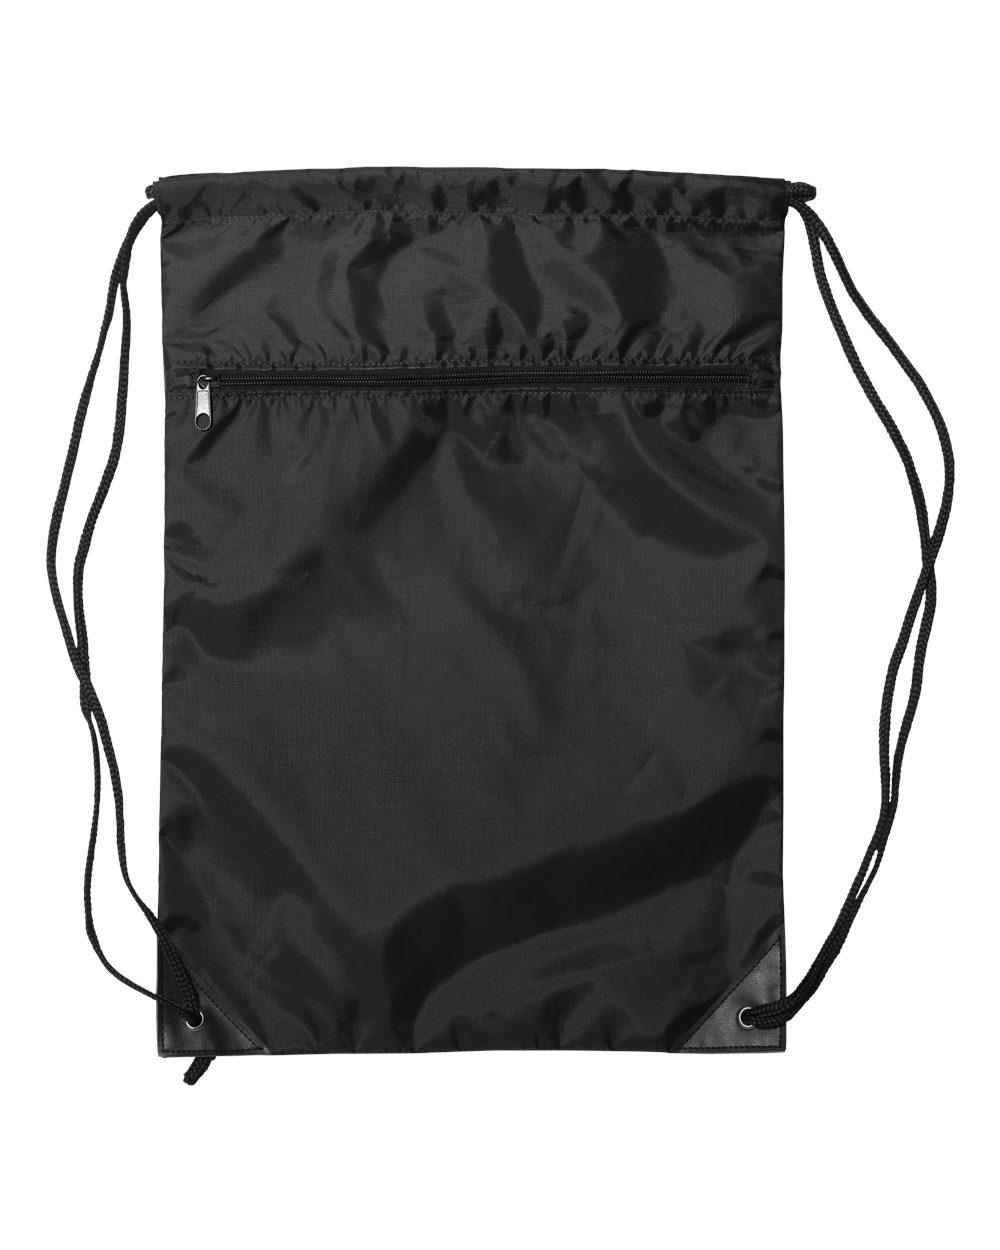 Liberty Bags 8888 - Denier Nylon Zippered Drawstring Backpack